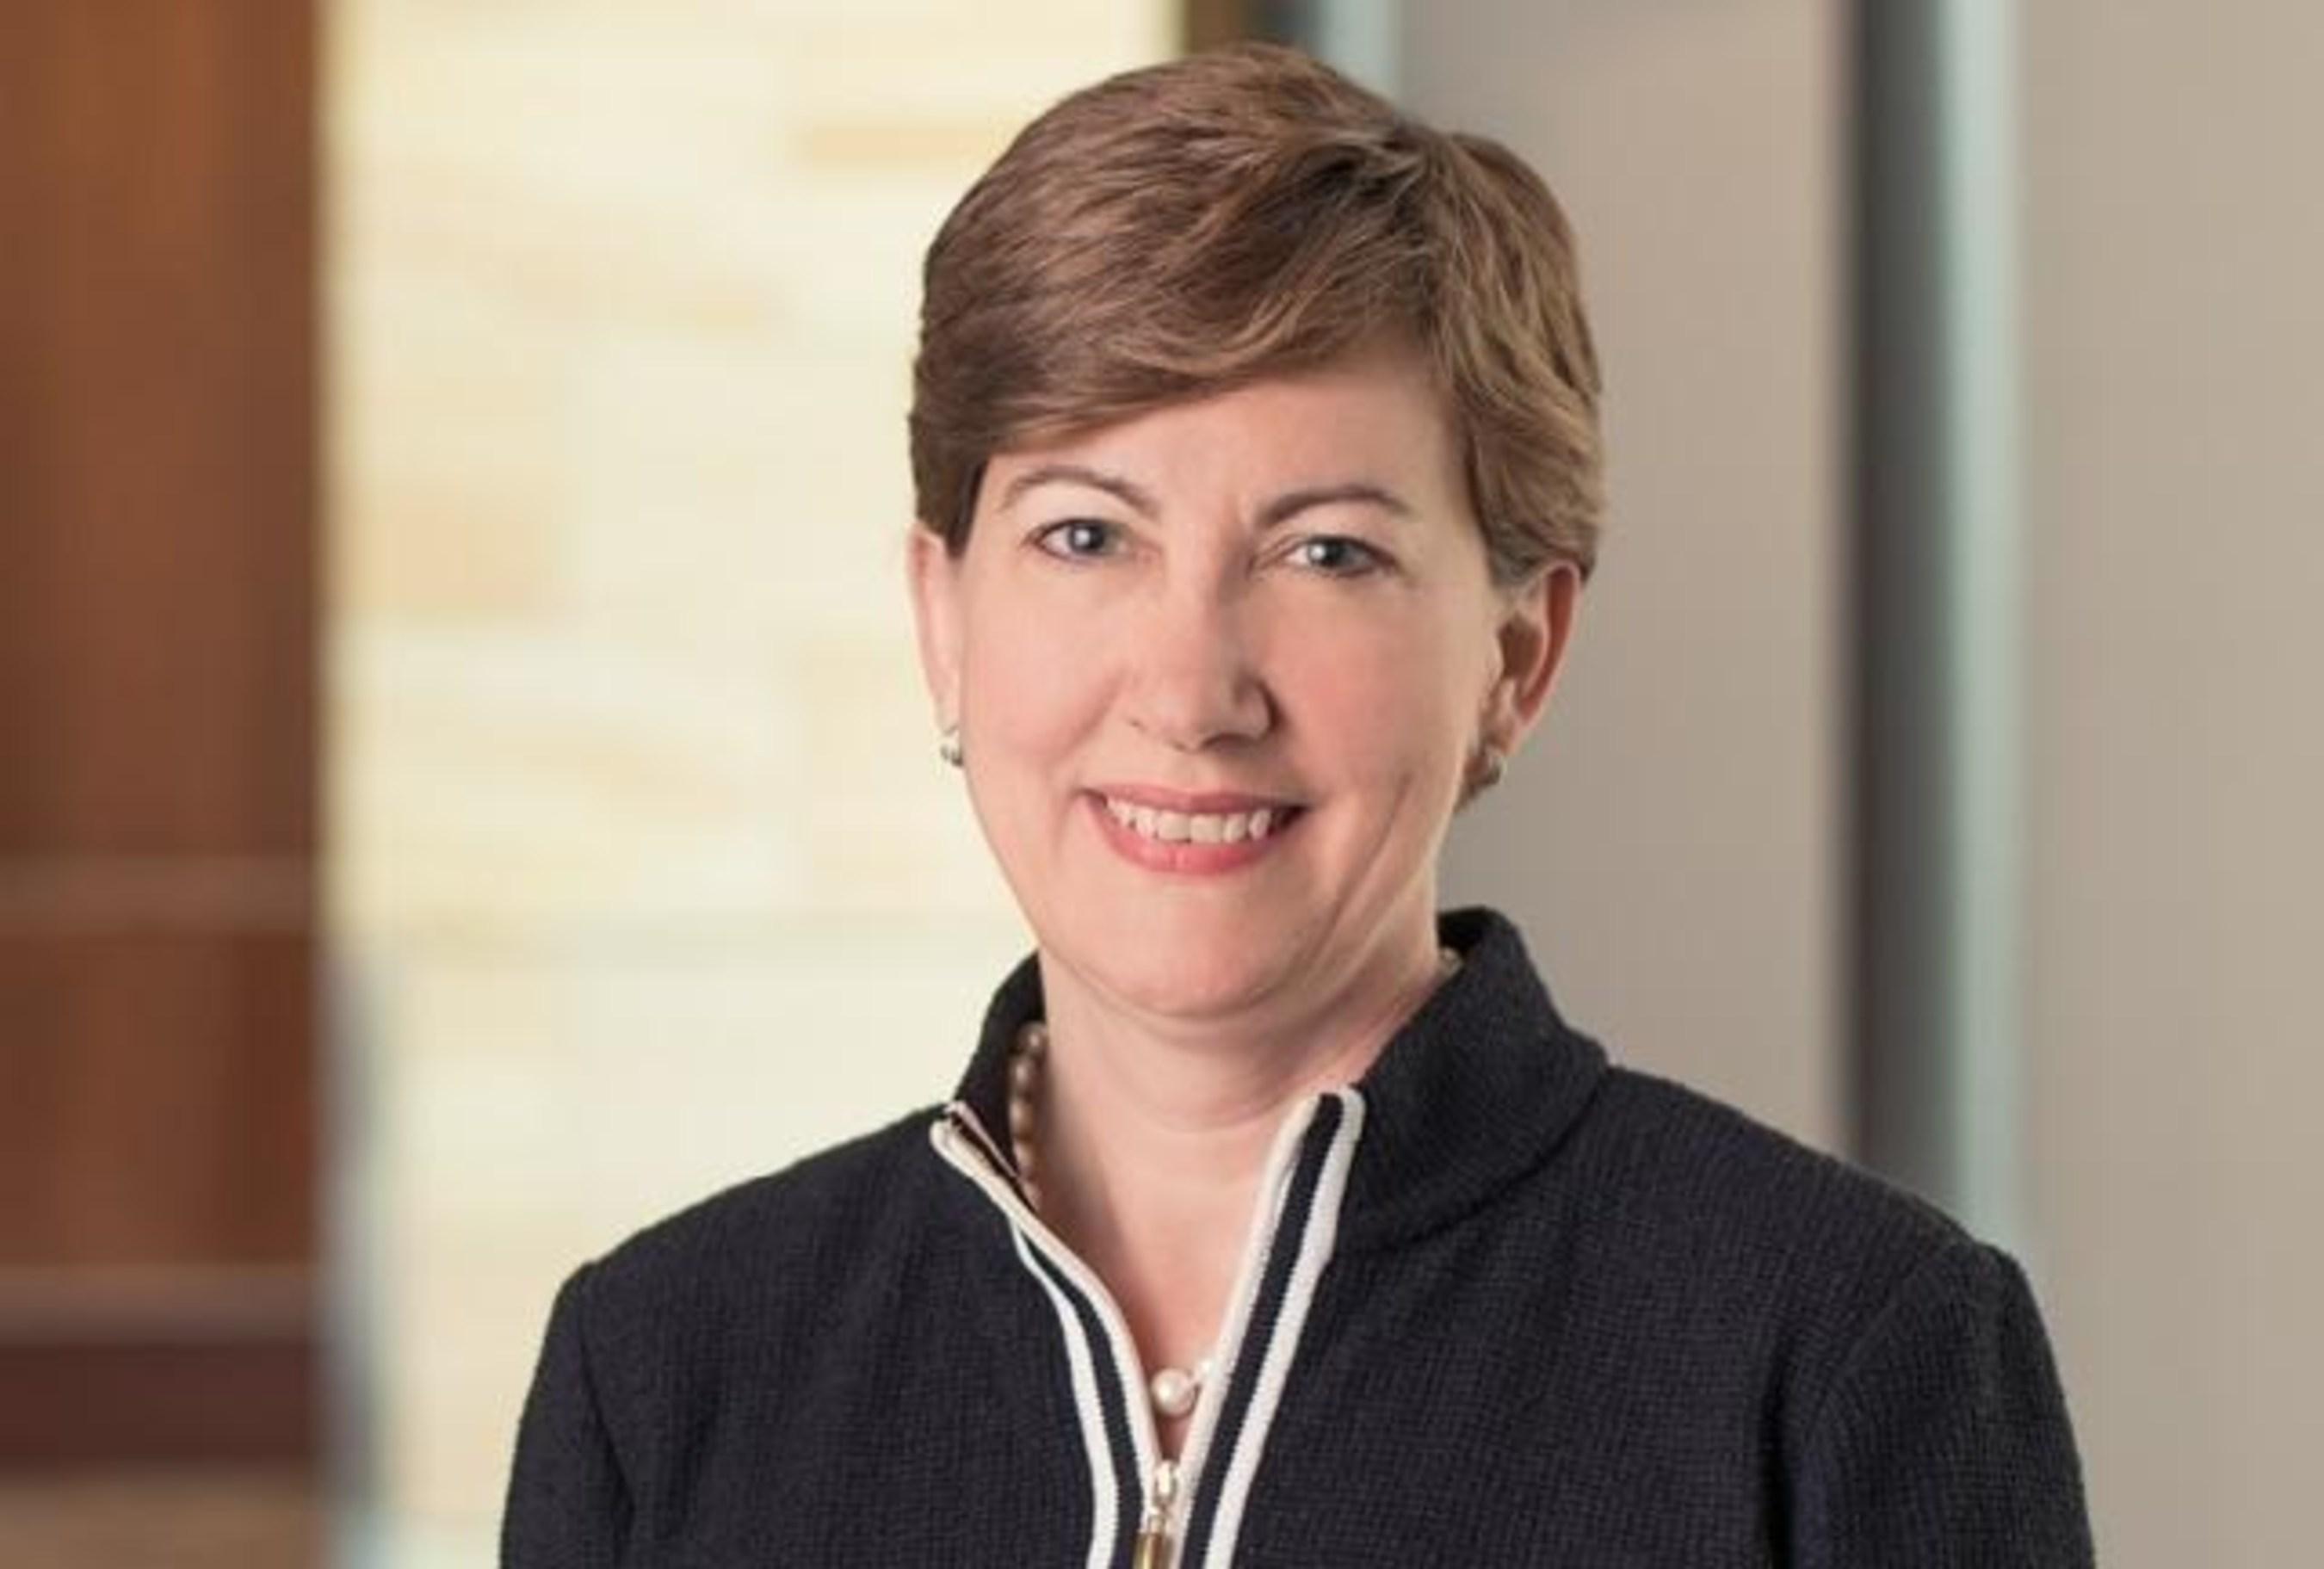 Bonnie Gwin, Vice Chairman - Co-Managing Partner, Global CEO & Board Practice - Heidrick & Struggles